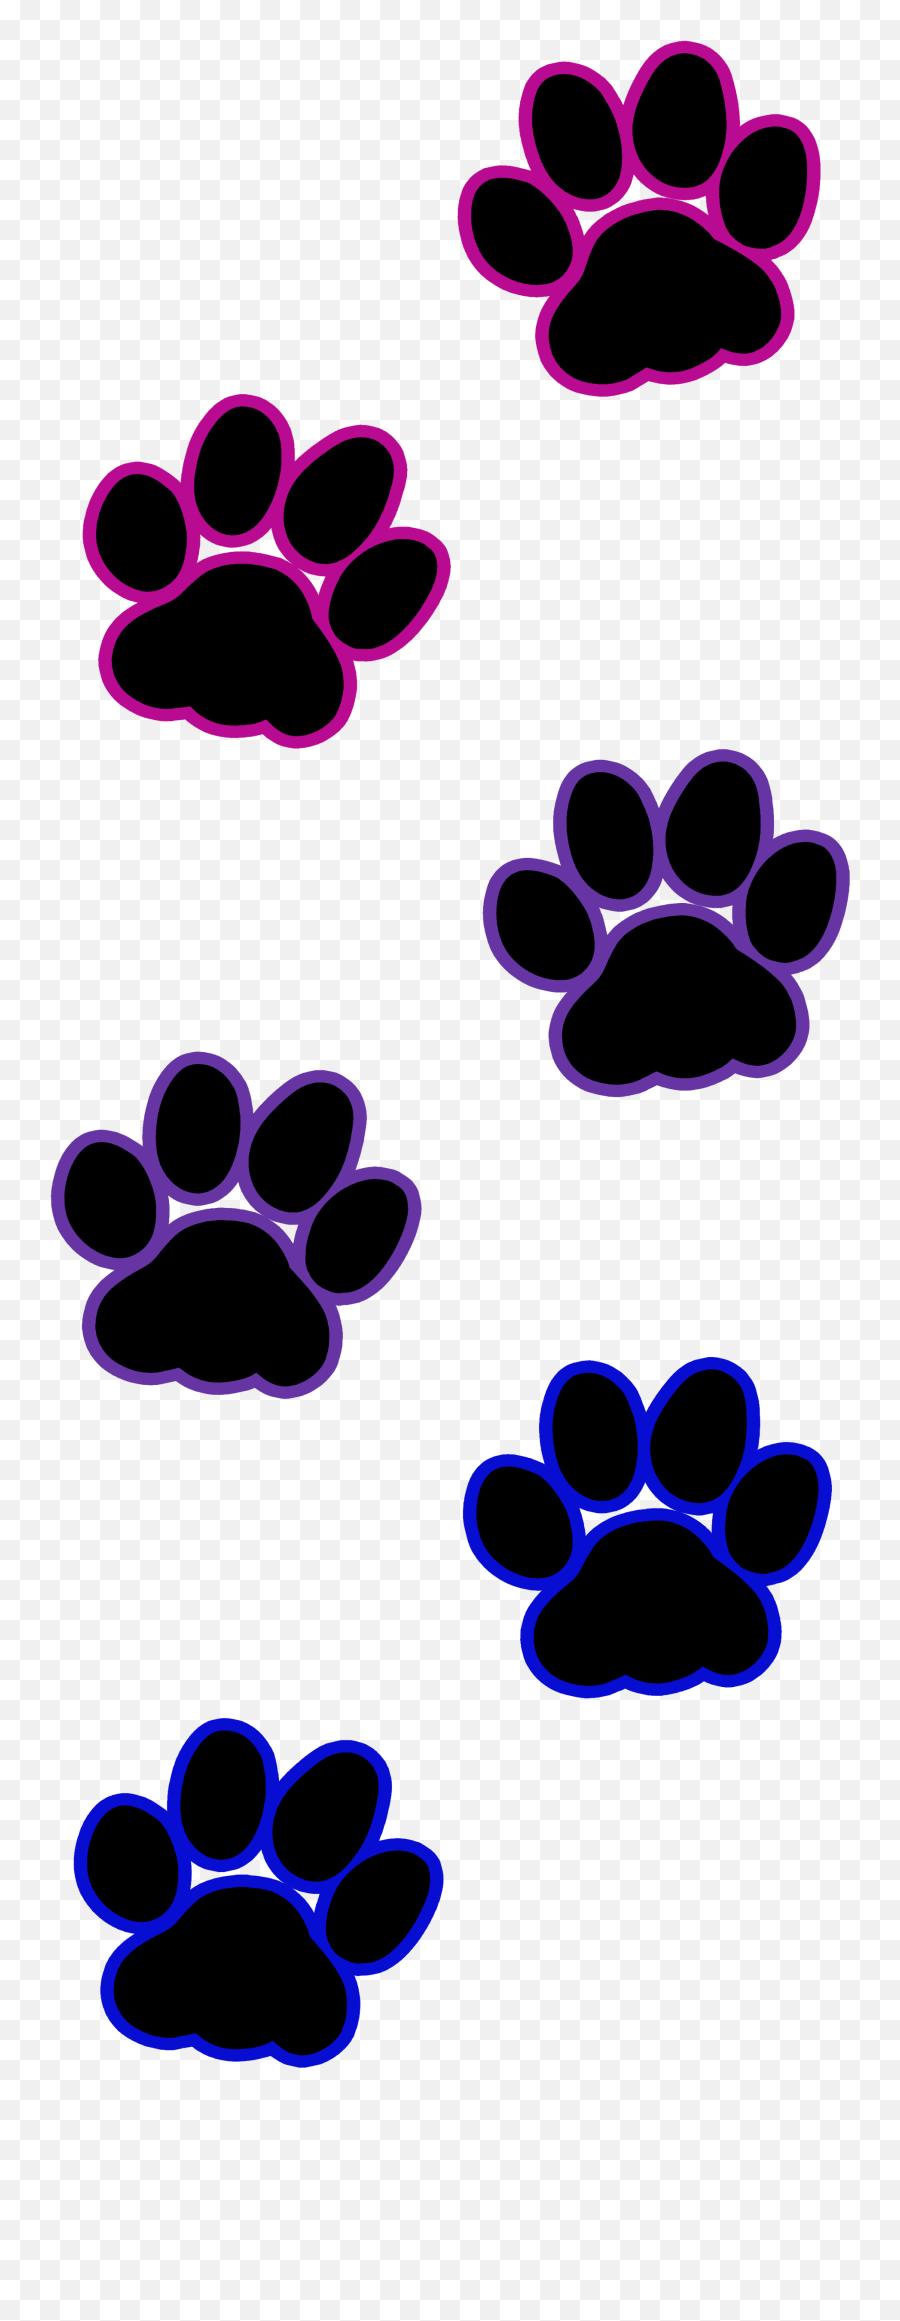 Pawprint clipart cat Pawprint cat Transparent FREE for - Clip Art Cat Paw Print Emoji